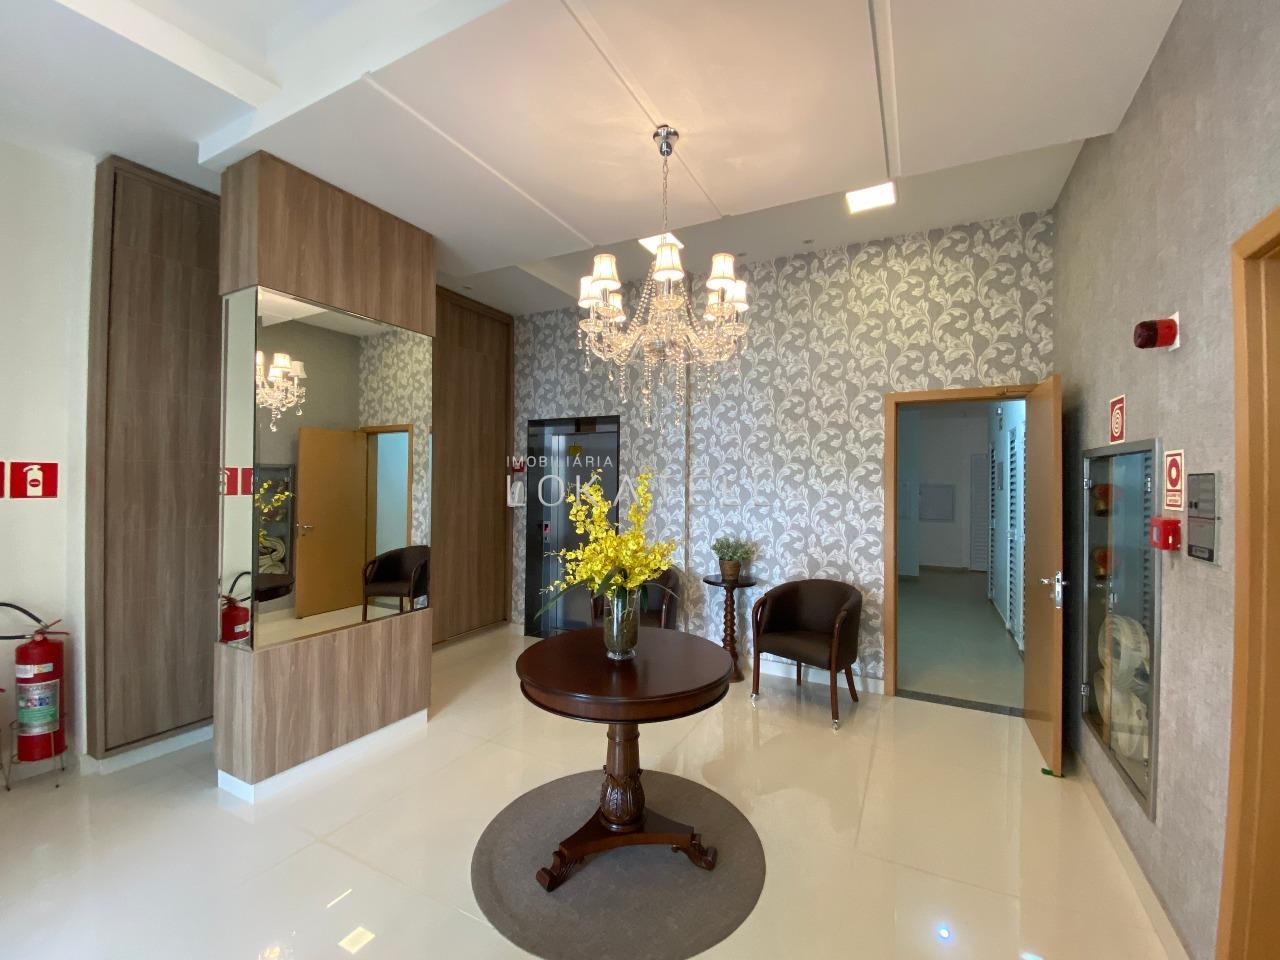 Apartamento para aluguel no CENTRO: hall social